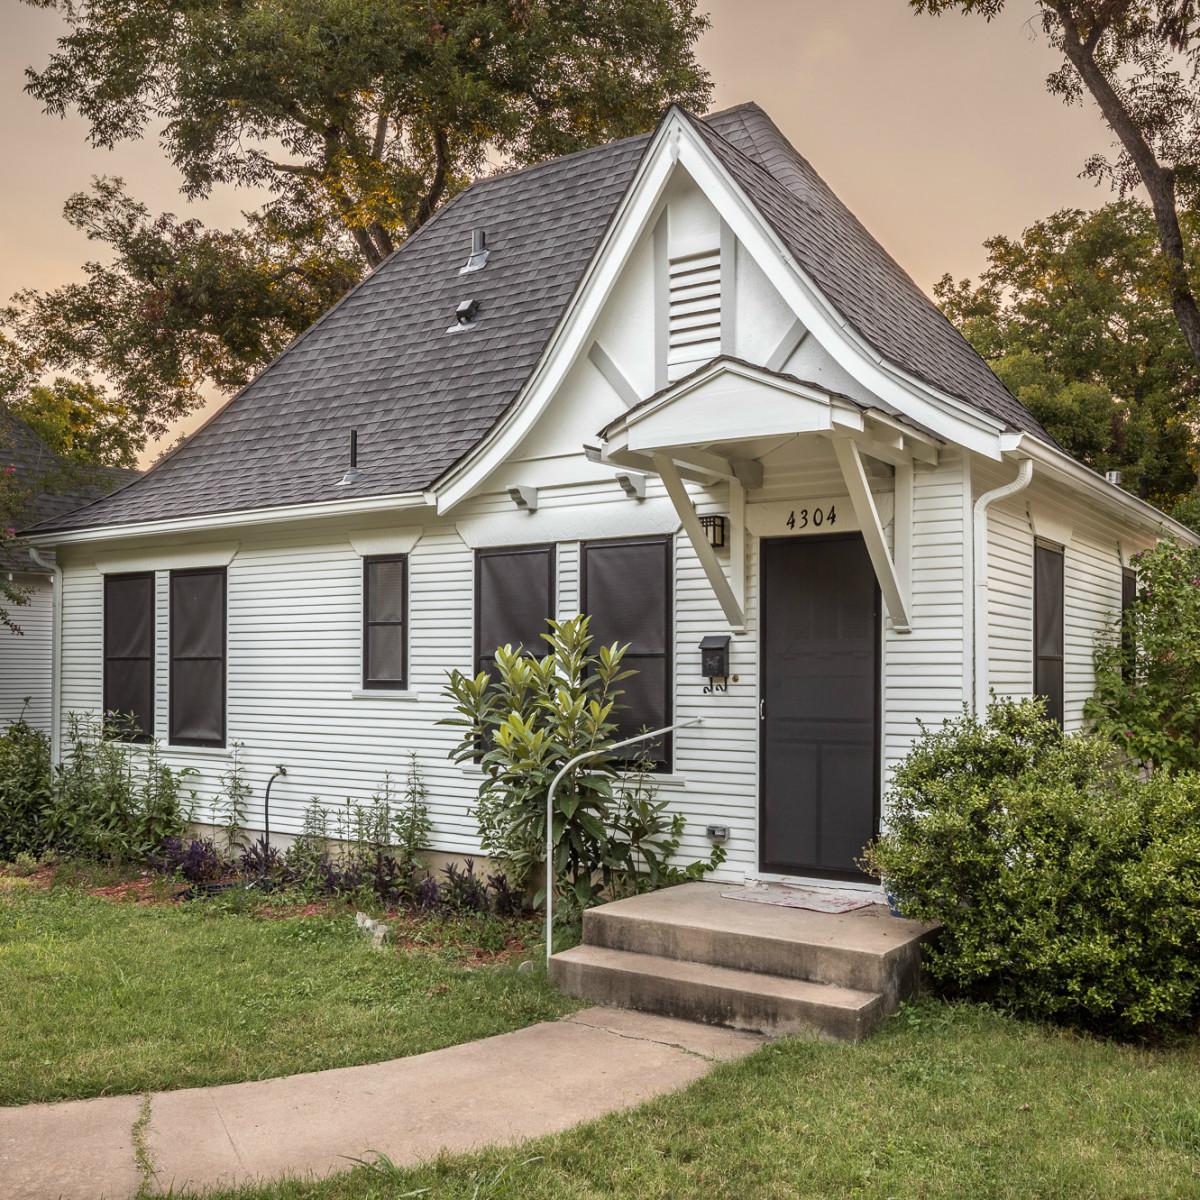 Historic Hyde Park Homes Tour 2015 Calcasieu Lumber Company cottage house